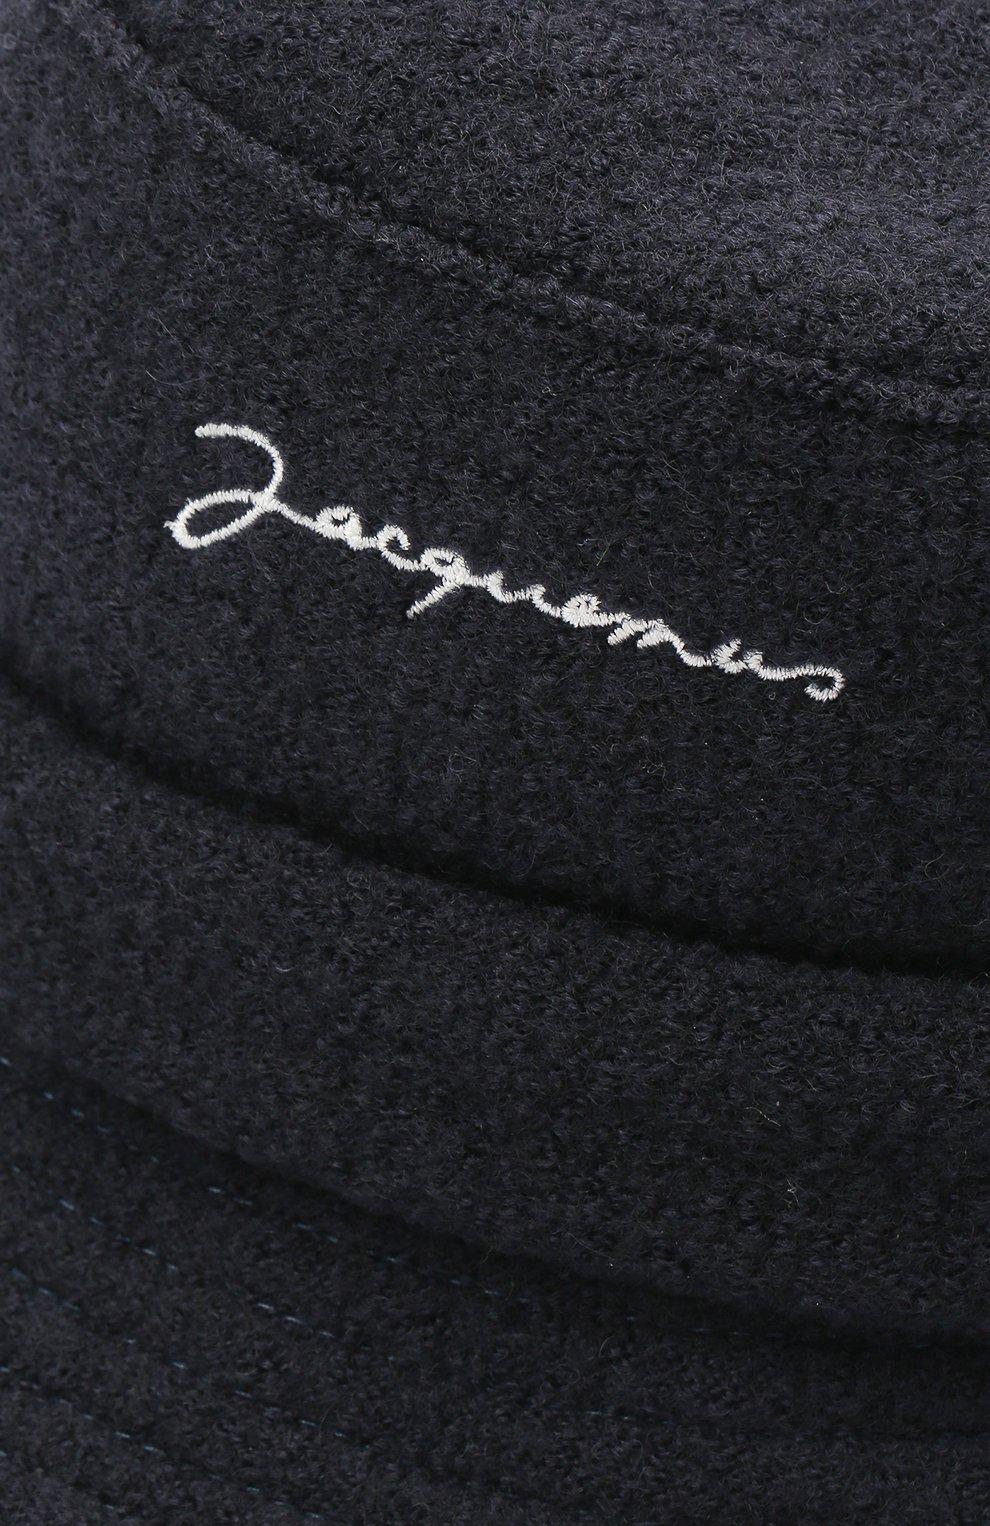 Мужская шерстяная панама le bob JACQUEMUS темно-синего цвета, арт. 206AC03/512380 | Фото 3